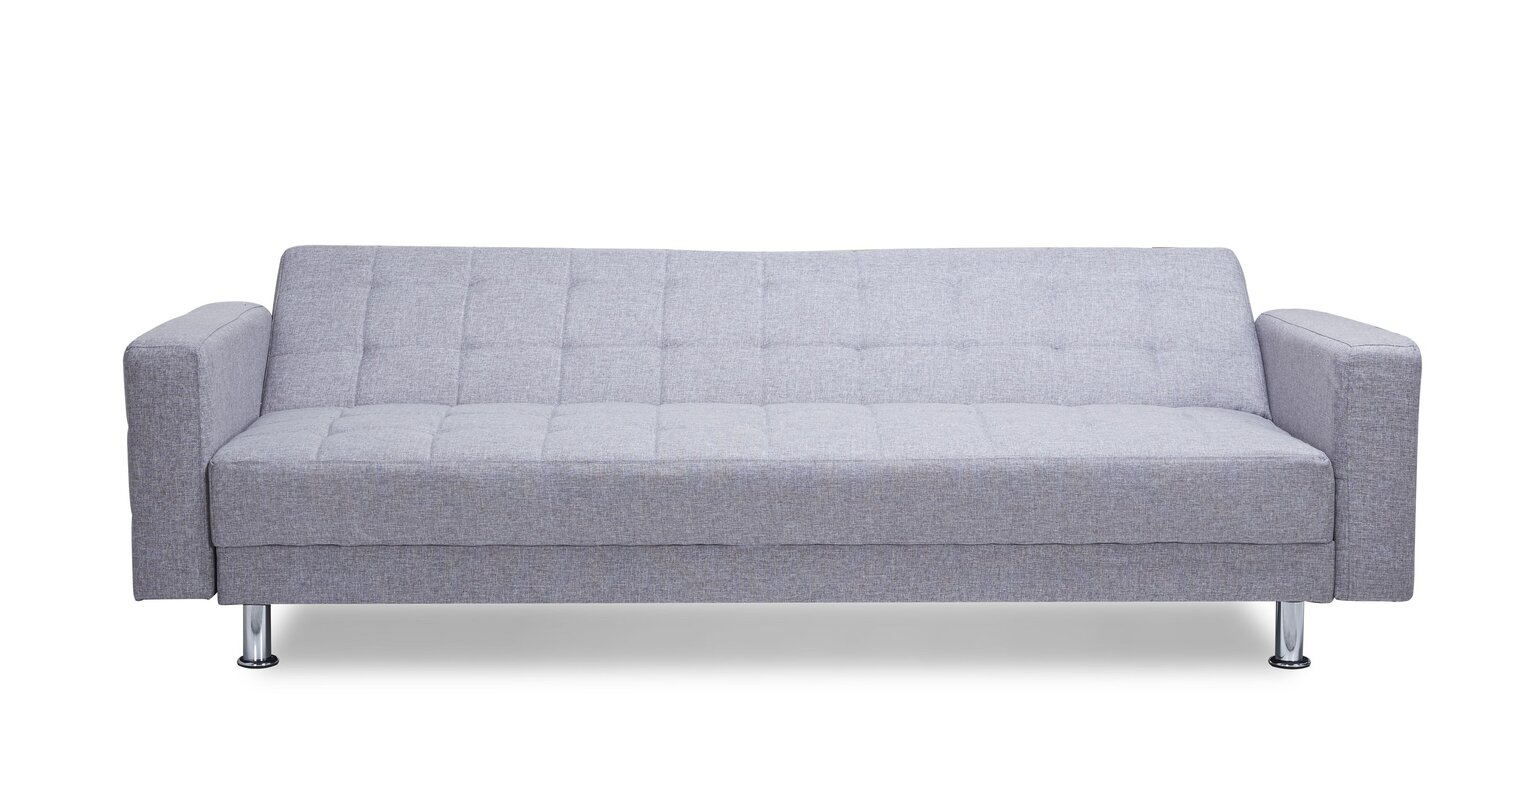 Spirit Lake Convertible Sleeper Sofa